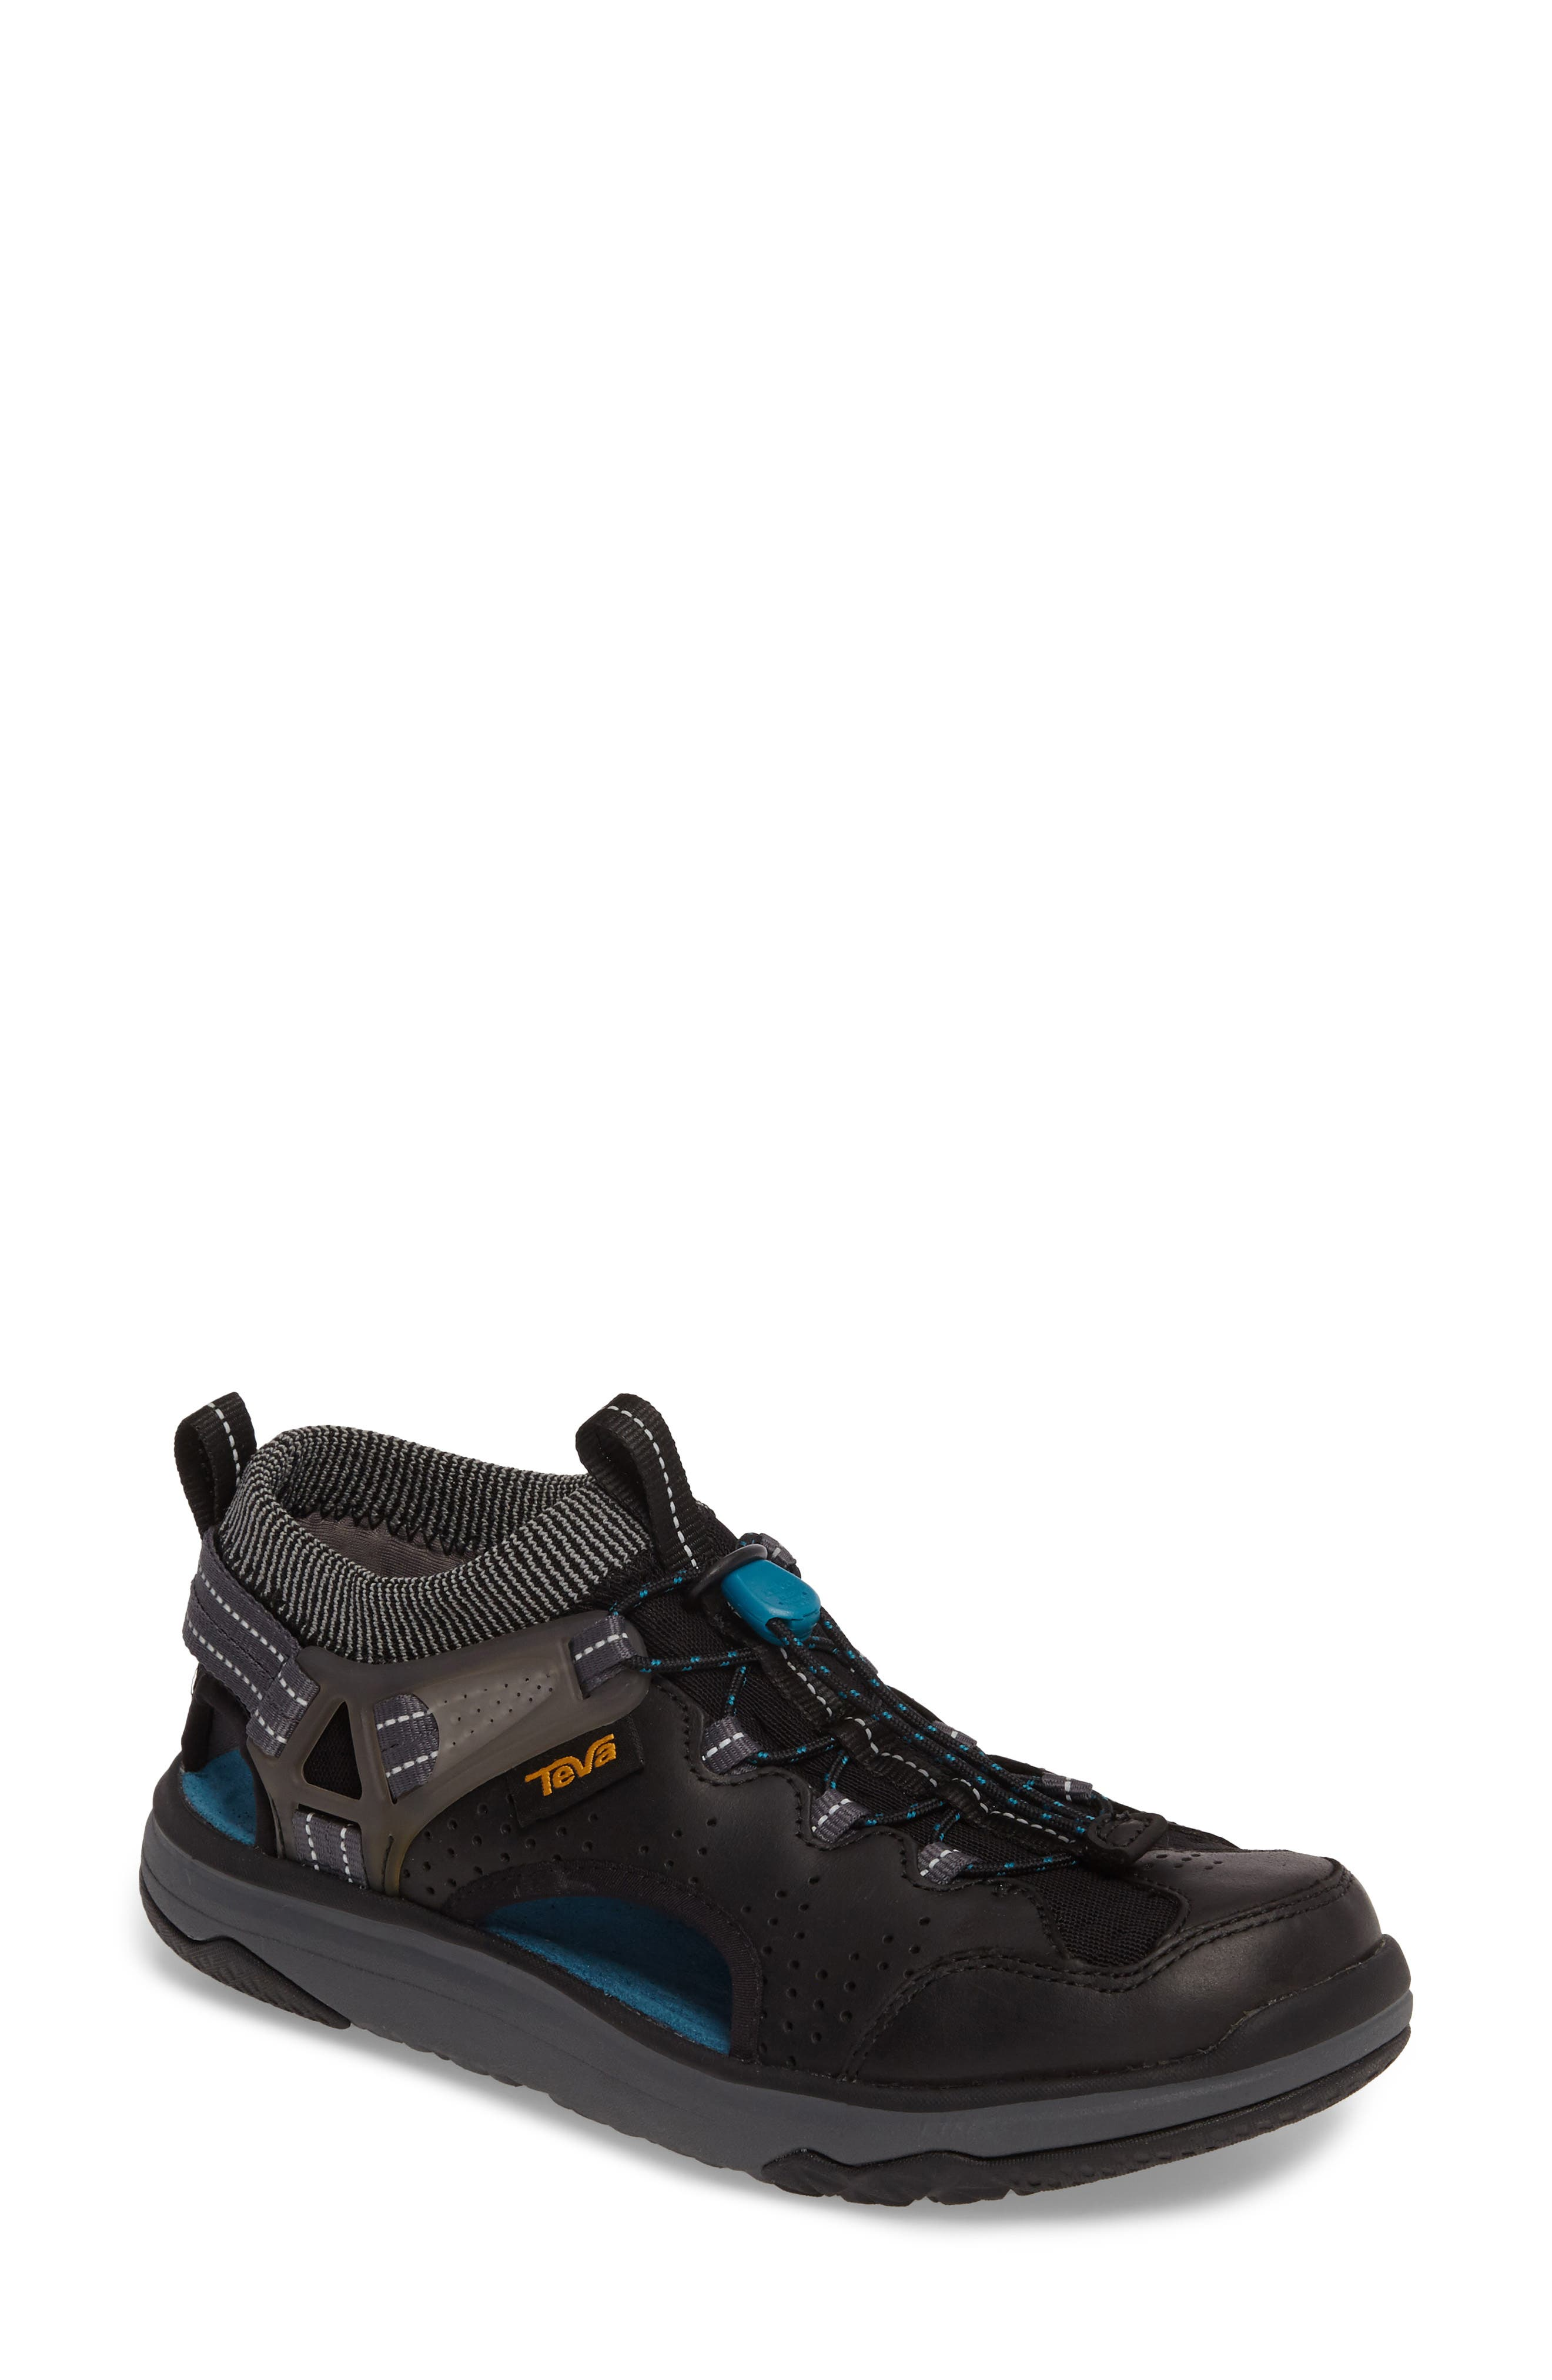 Terra Float Travel Sandal,                             Main thumbnail 1, color,                             Black Leather